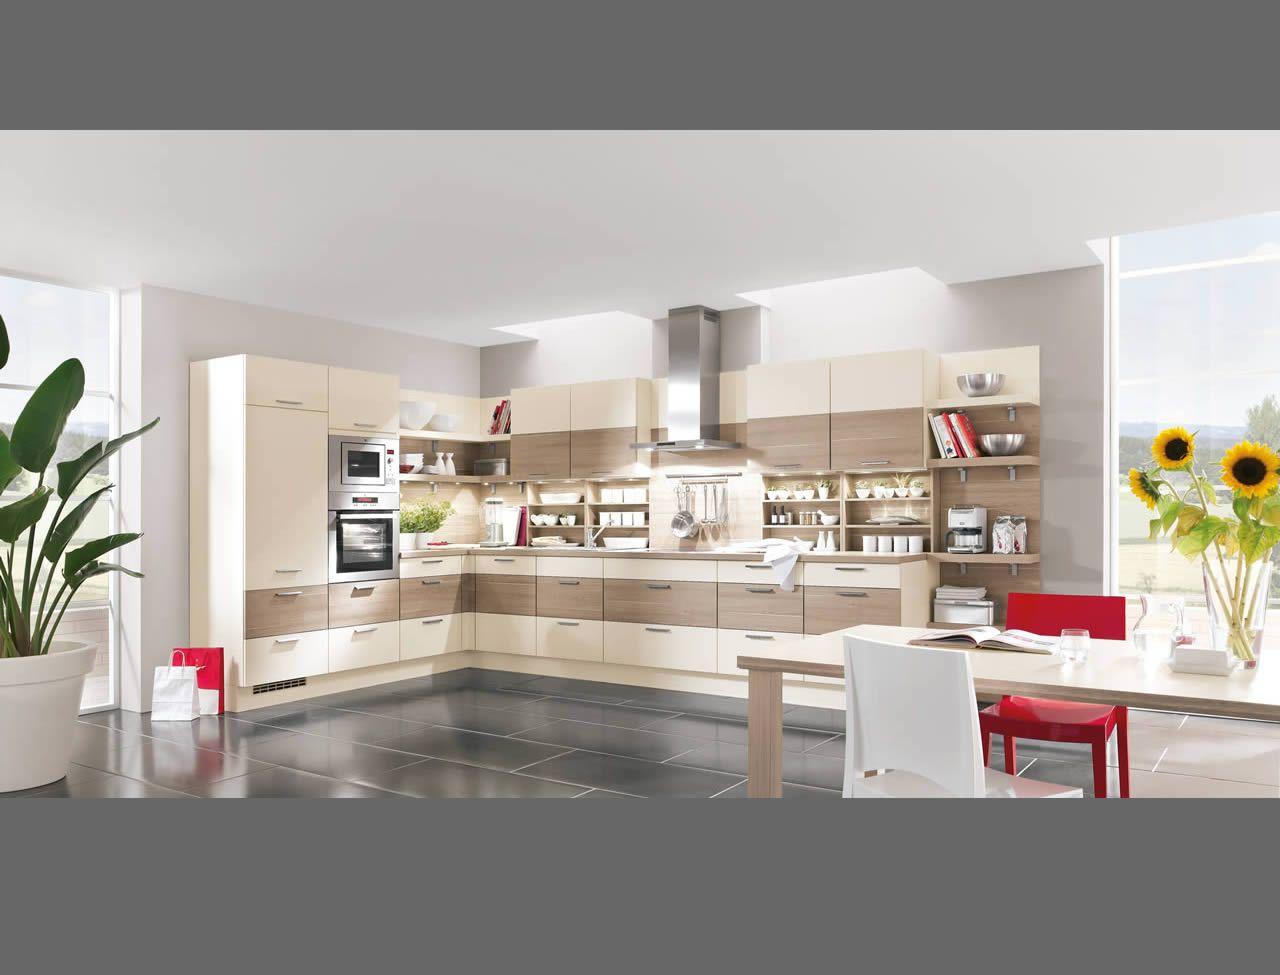 Schön Laser 426 Hones Ivory / Flared Oak Reproduction Palazzo Kitchens U0026  Appliances Nobilia Küchen   Kitchens